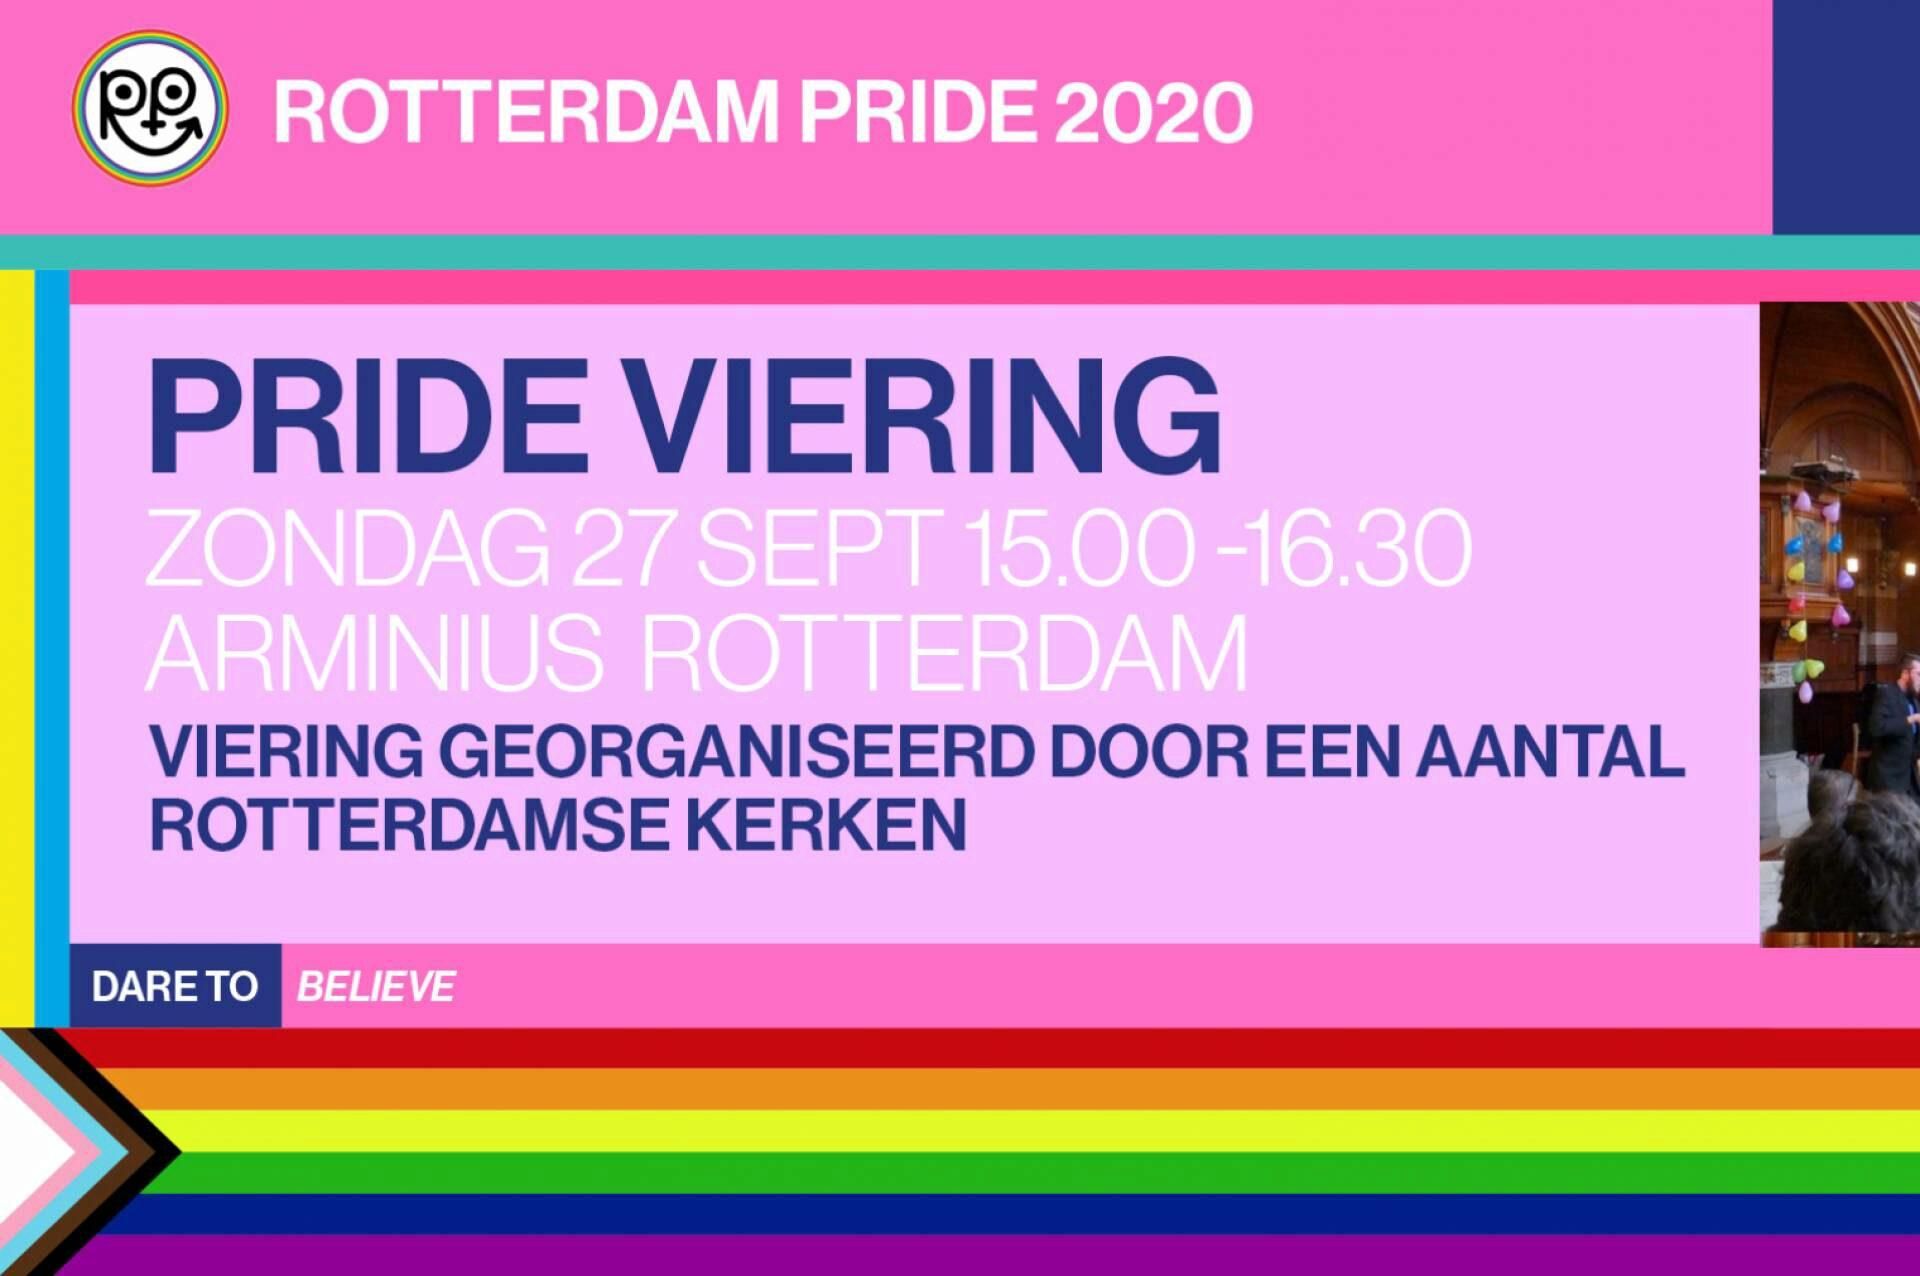 Rotterdam Pride Viering 2020